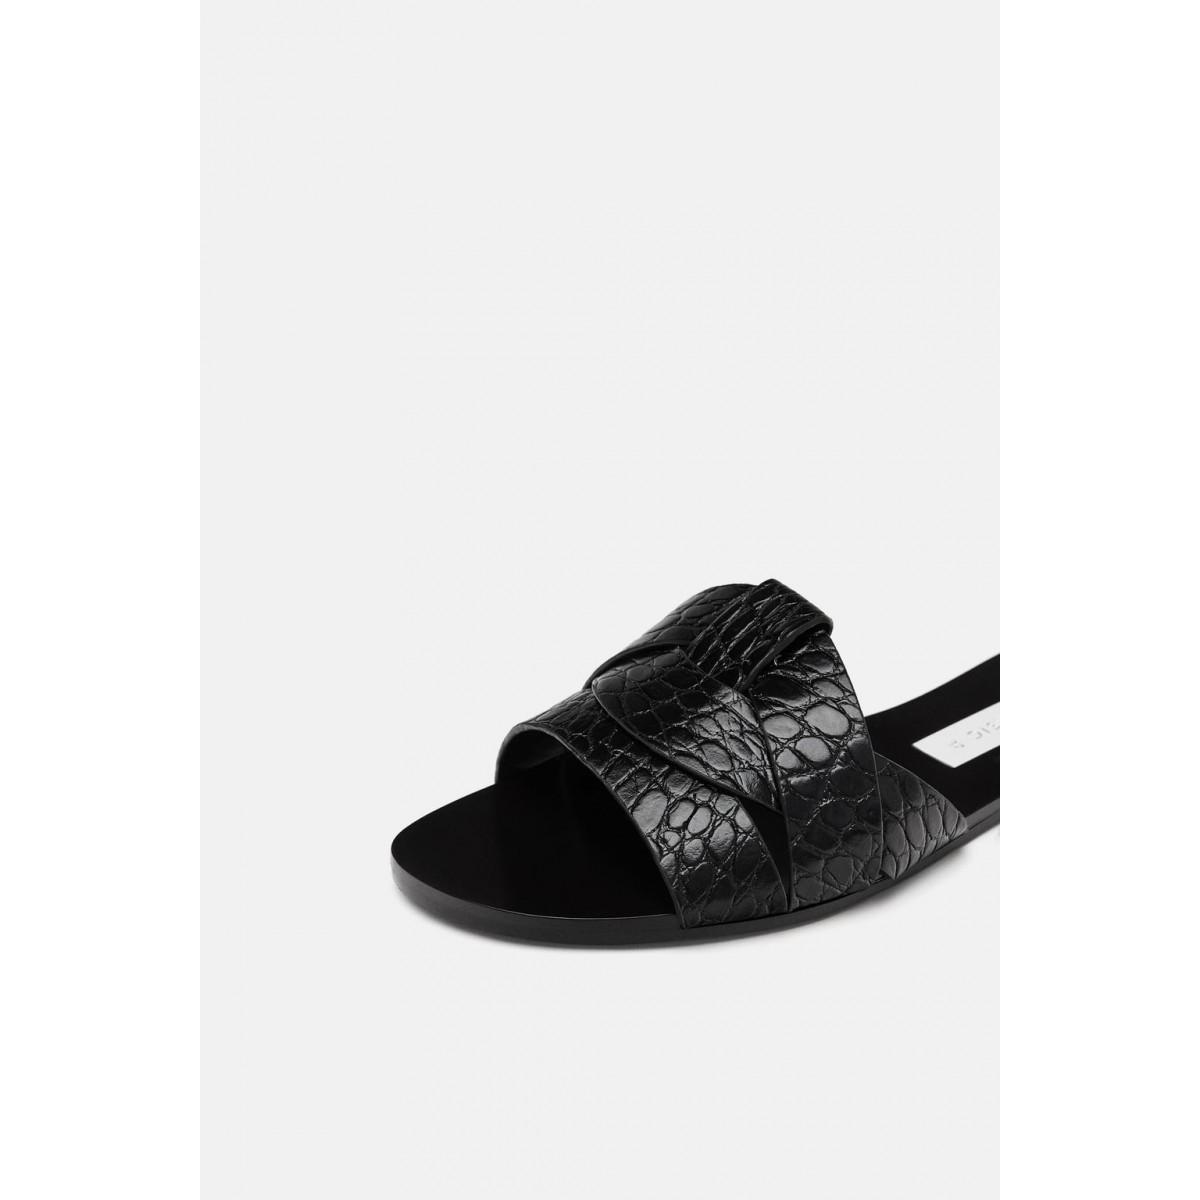 Zara Animal Print Leather Flat Sandals (Black)